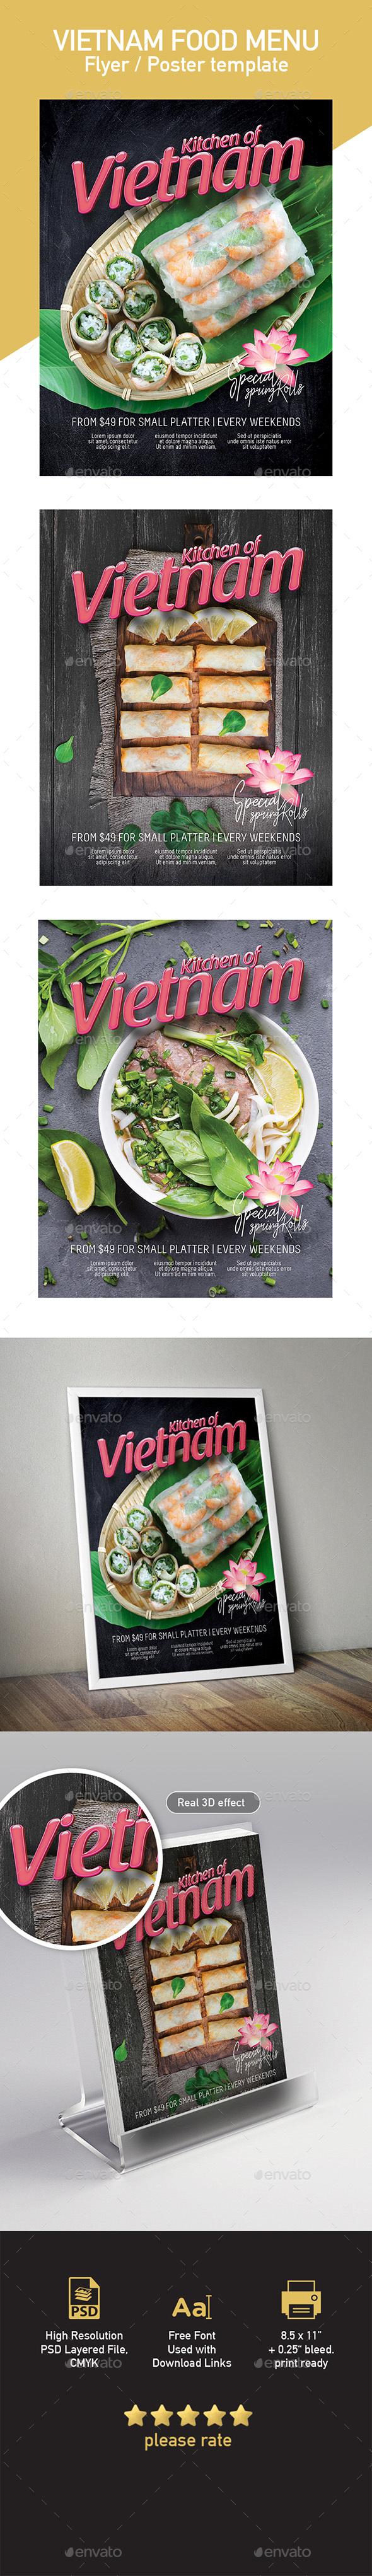 Template of Vietnamese Food Restaurant Menu - Restaurant Flyers